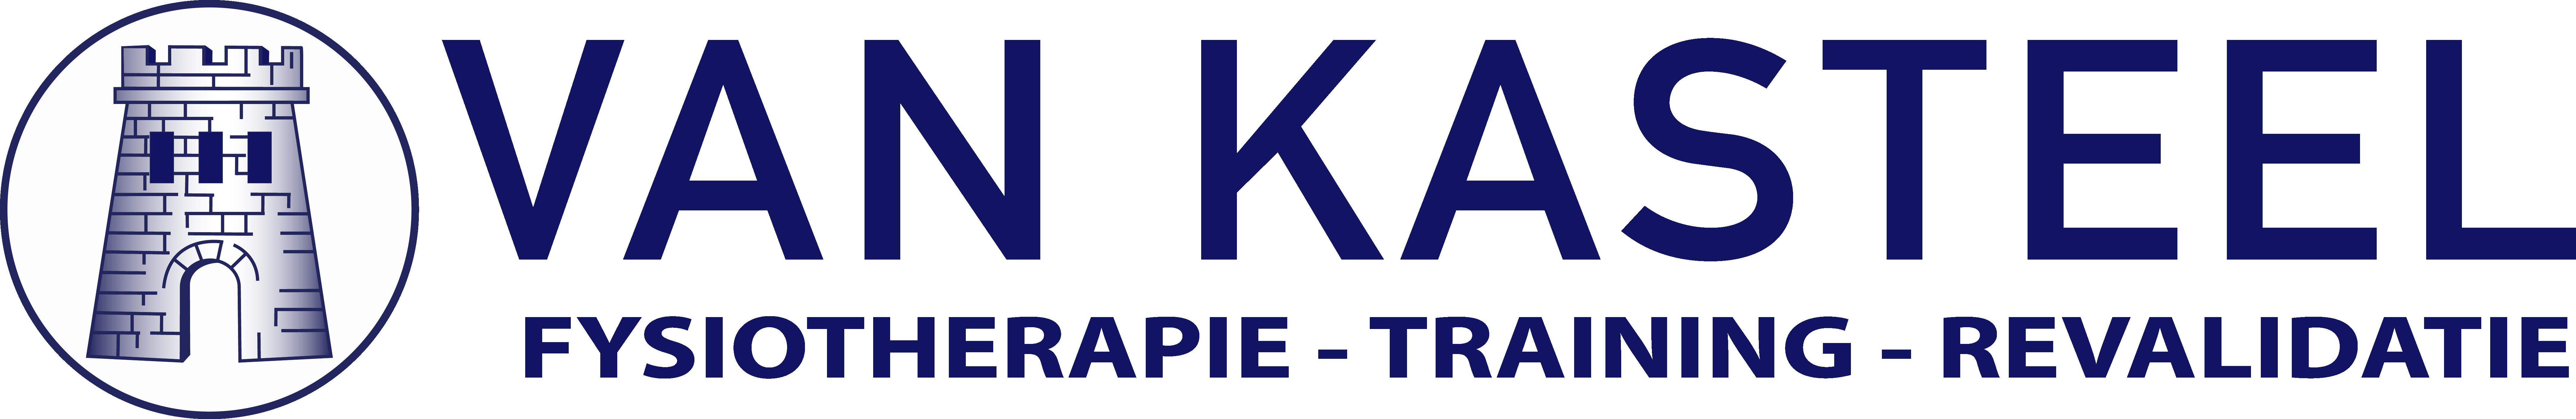 Van Kasteel fysiotherapie